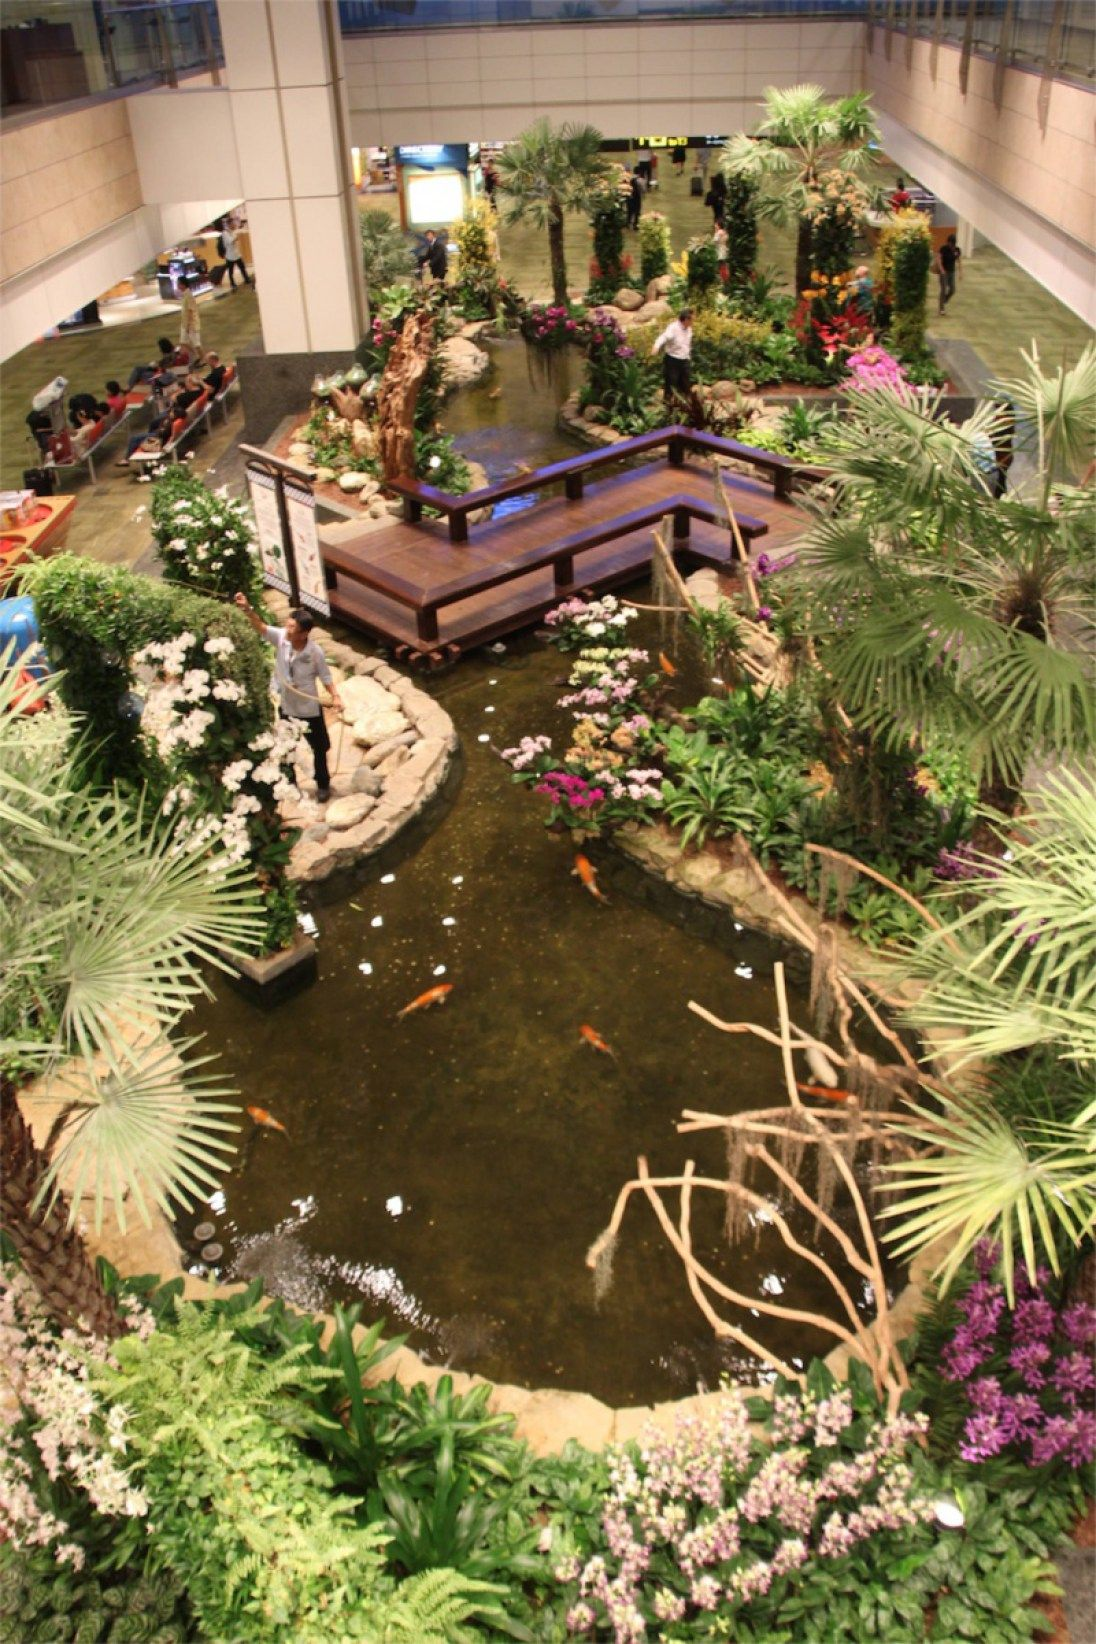 Changi Airport Singapore Ten Top Things To Do Singapore Garden